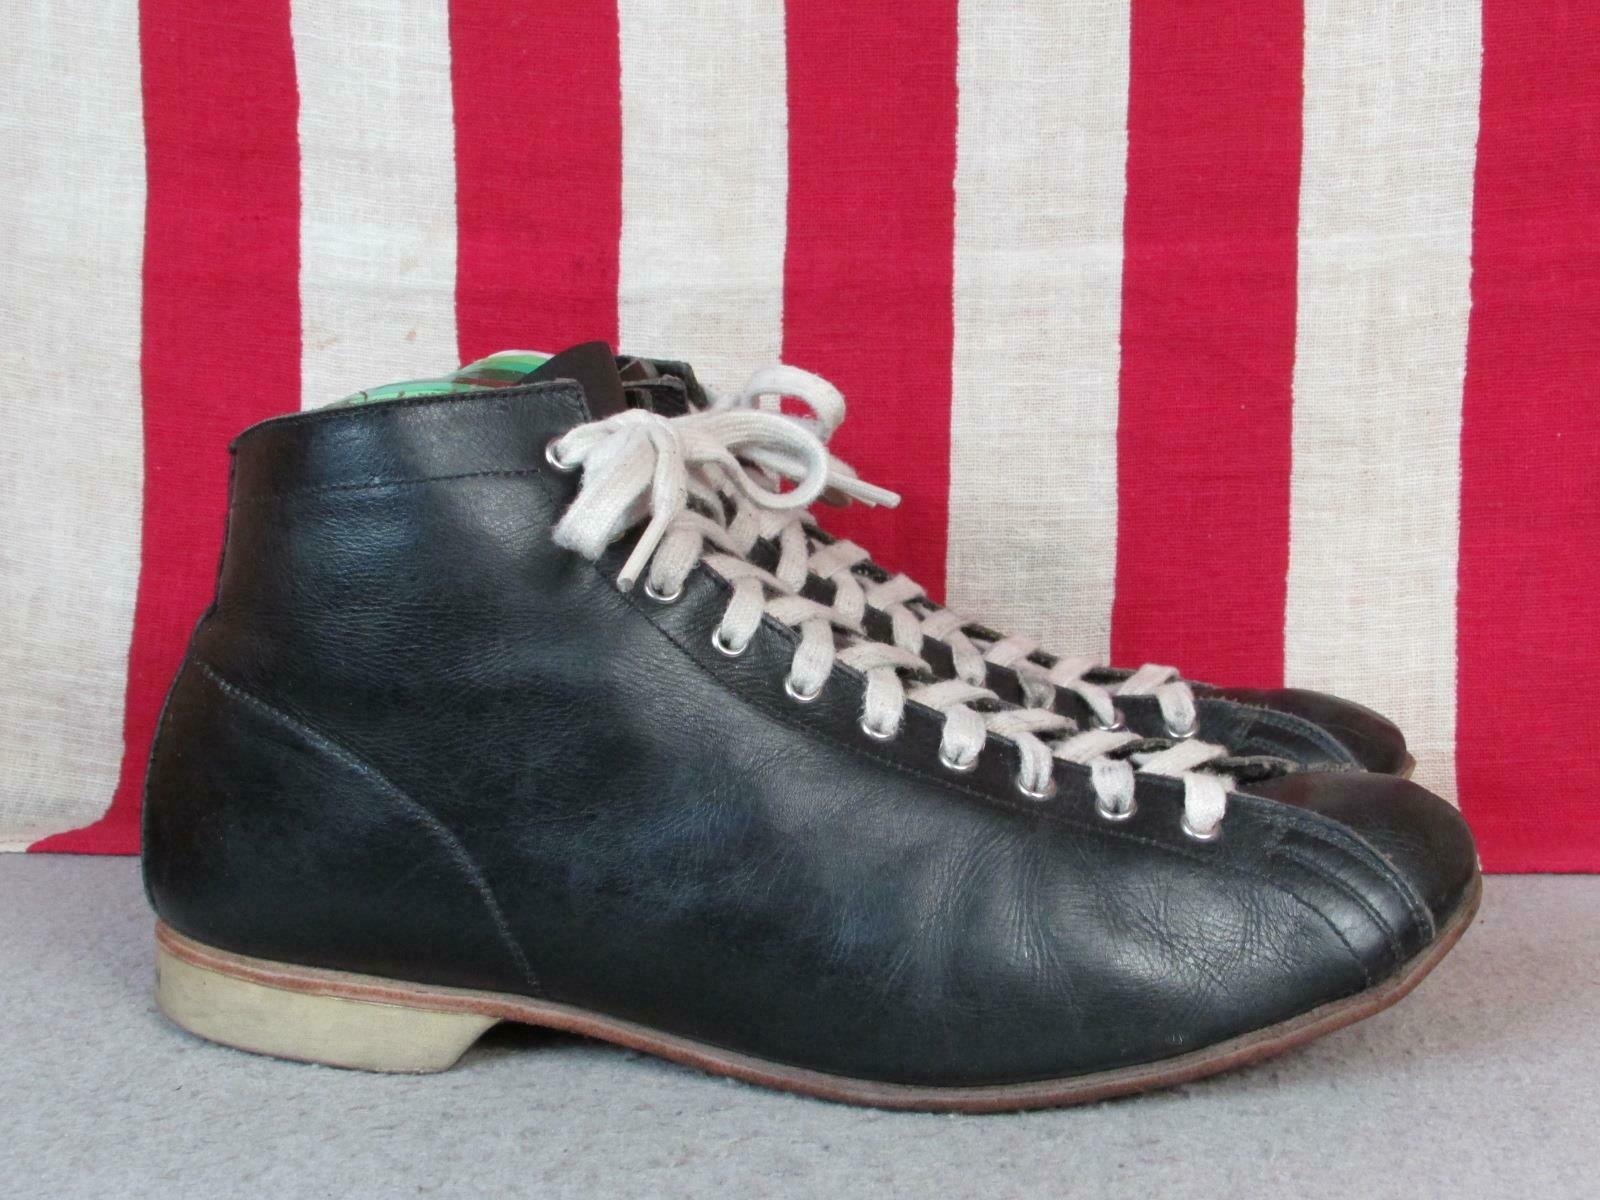 Vintage 1930s Black Leather High Top Athletic Sho… - image 2